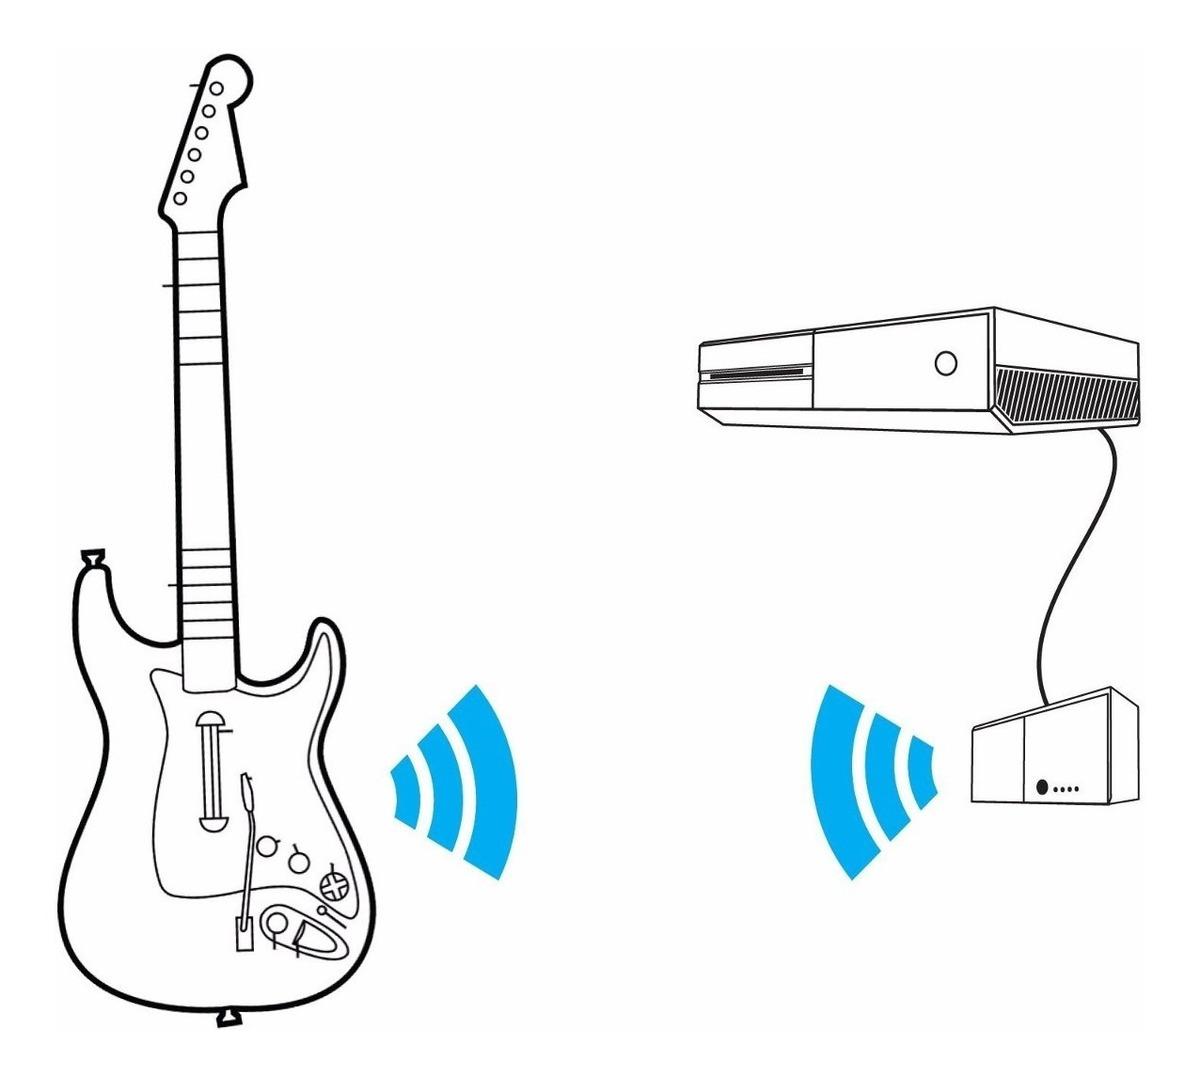 Adaptador Guitarra Bateria Rockband 4 Xbox One